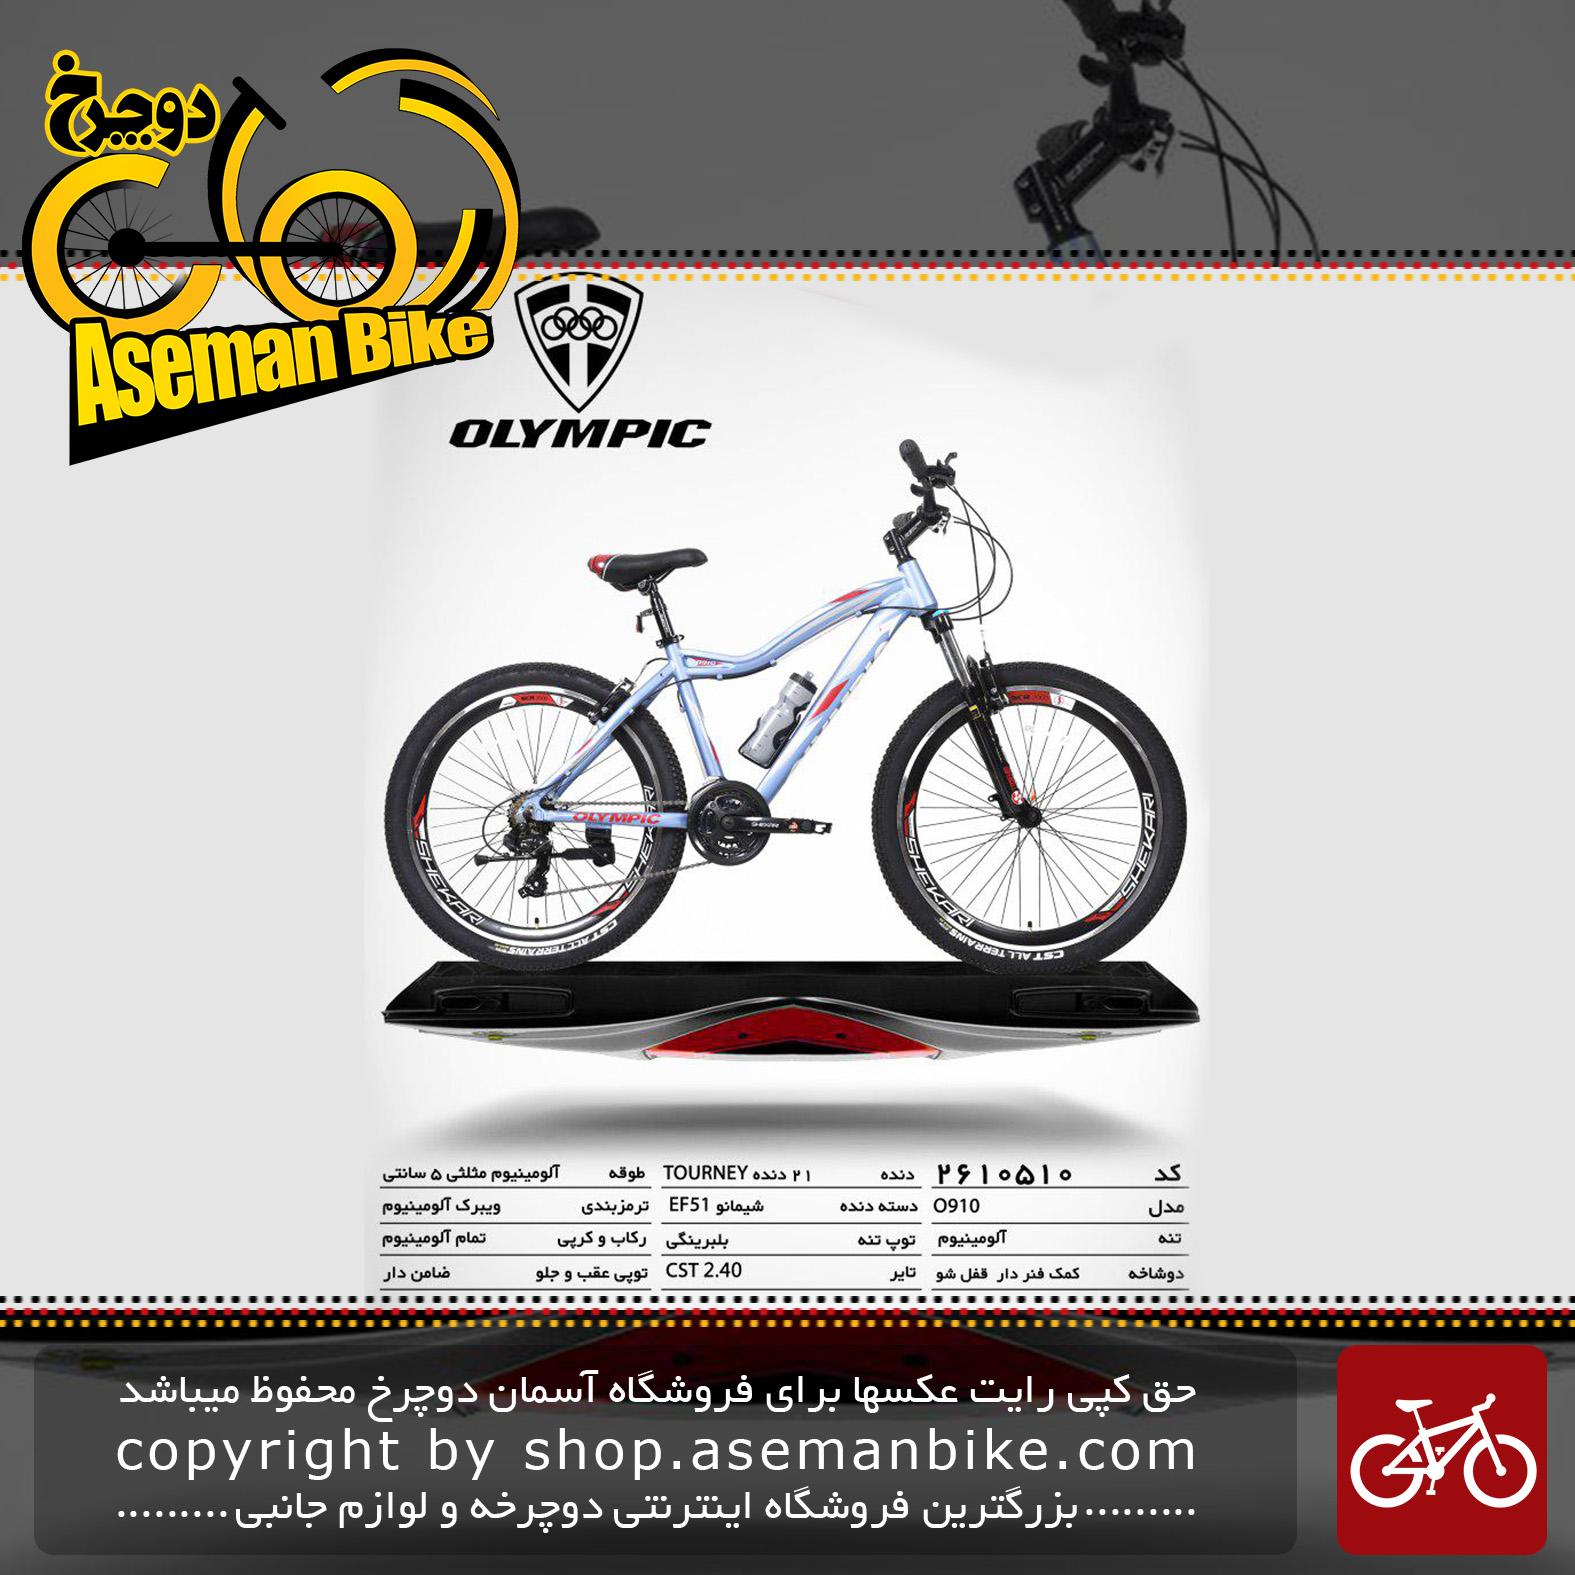 دوچرخه کوهستان شهری المپیک 21 دنده مدل او 910 سایز 26 ساخت تایوان OLYMPIC Mountain City Bicycle Taiwan O910 Size 26 2019